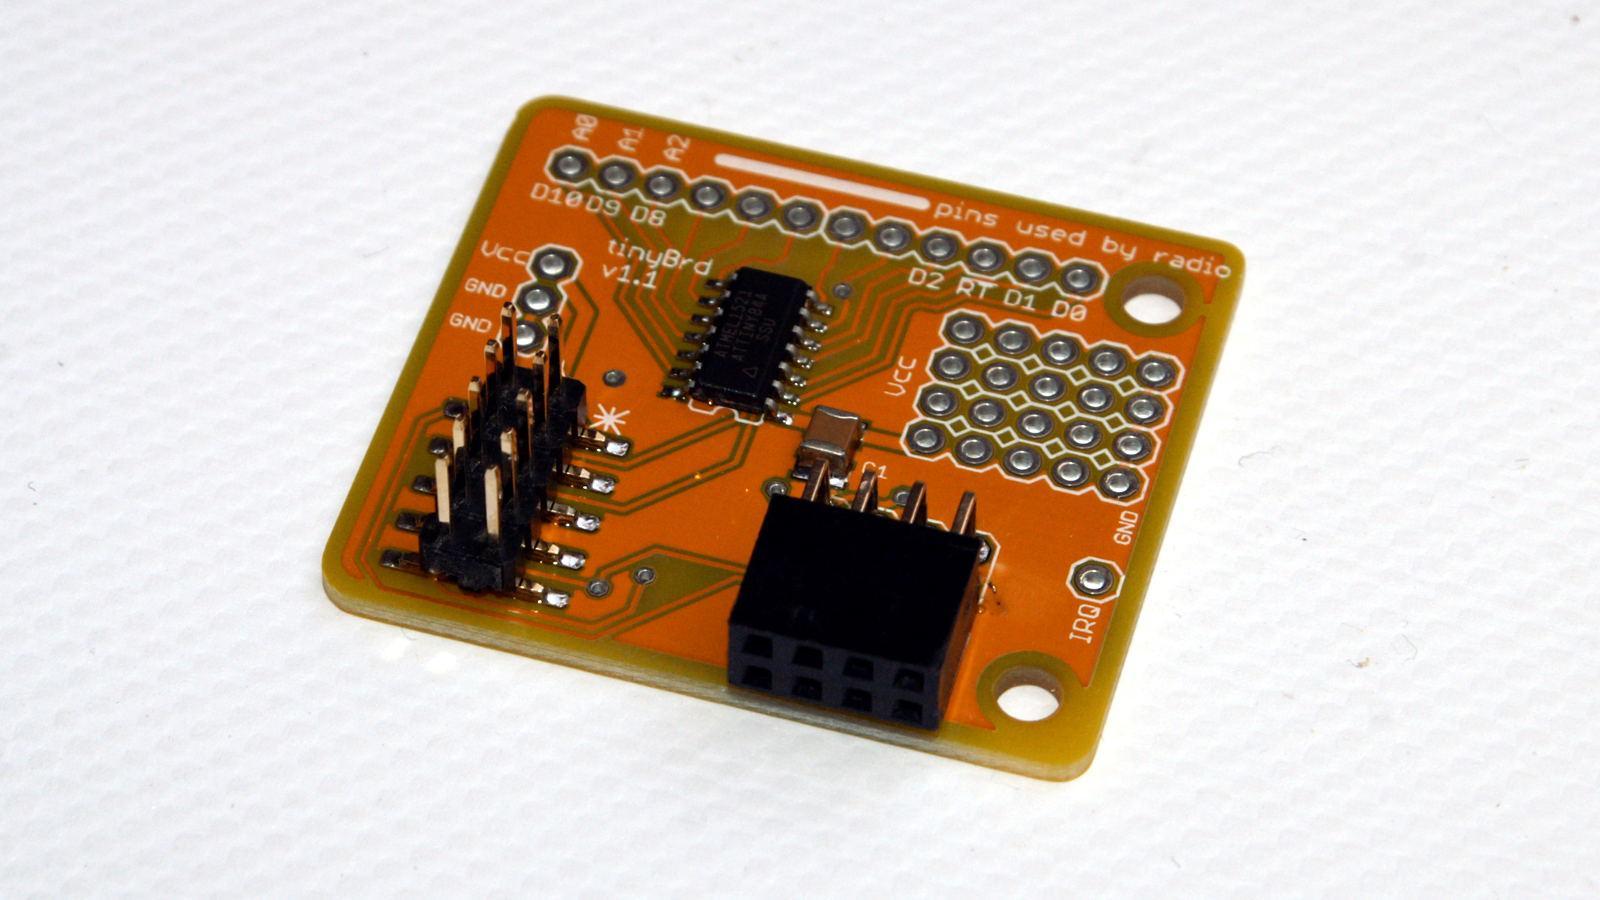 Nettigo: Wireless sensor - tinyBrd Arduino IDE compatible